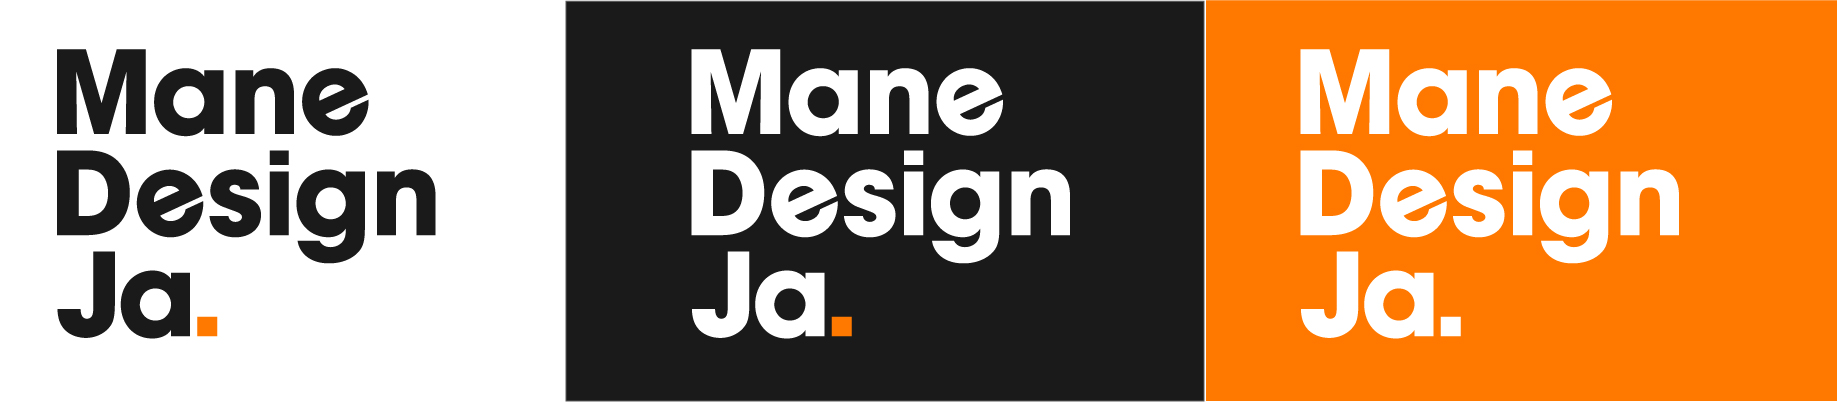 Mane Design Ja logo and variations